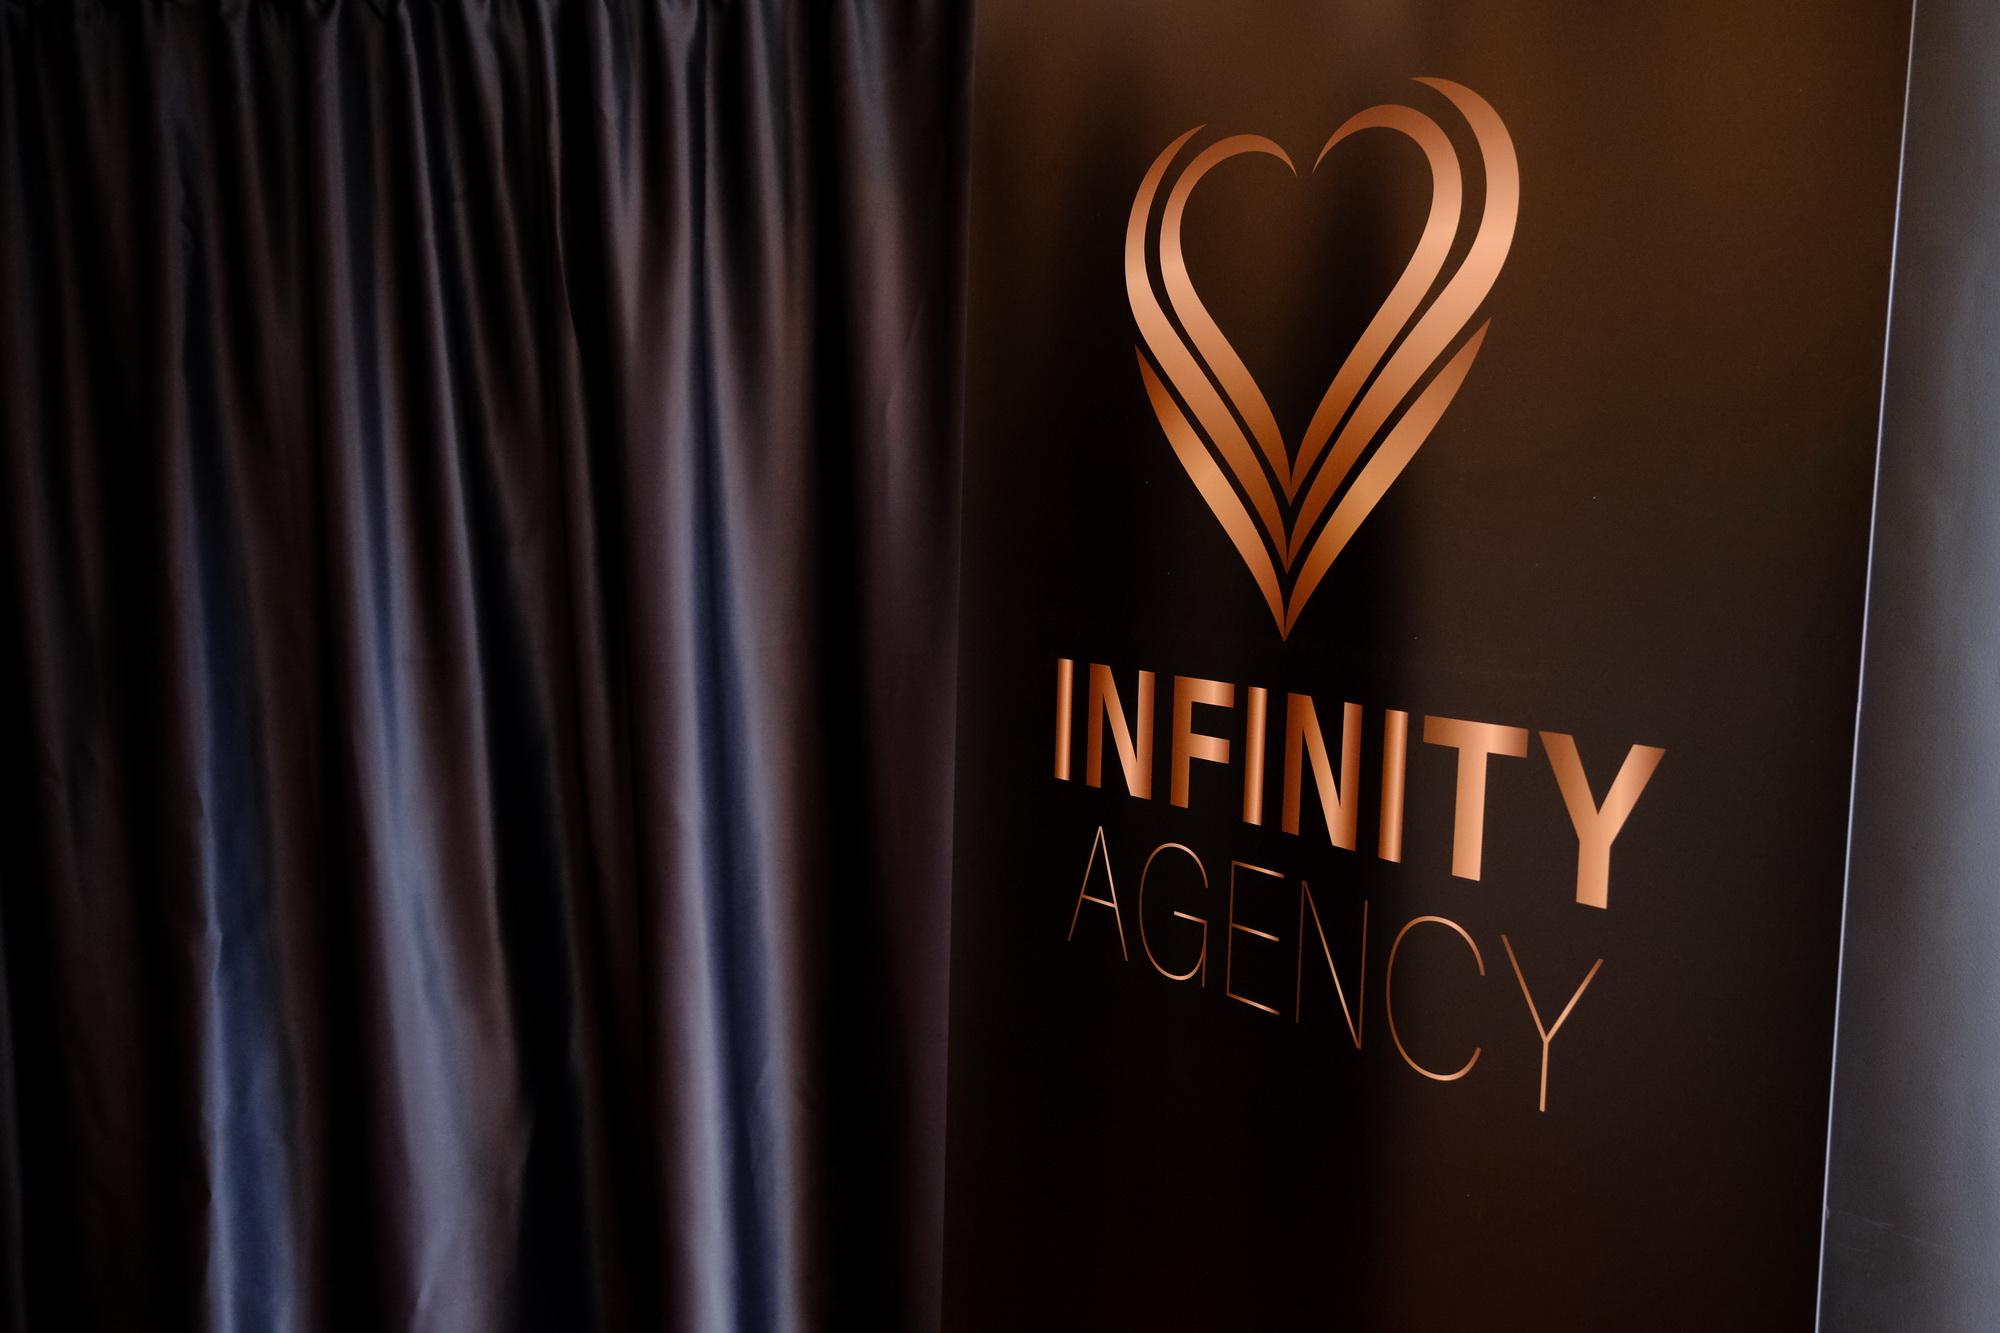 Infinity Agency_03